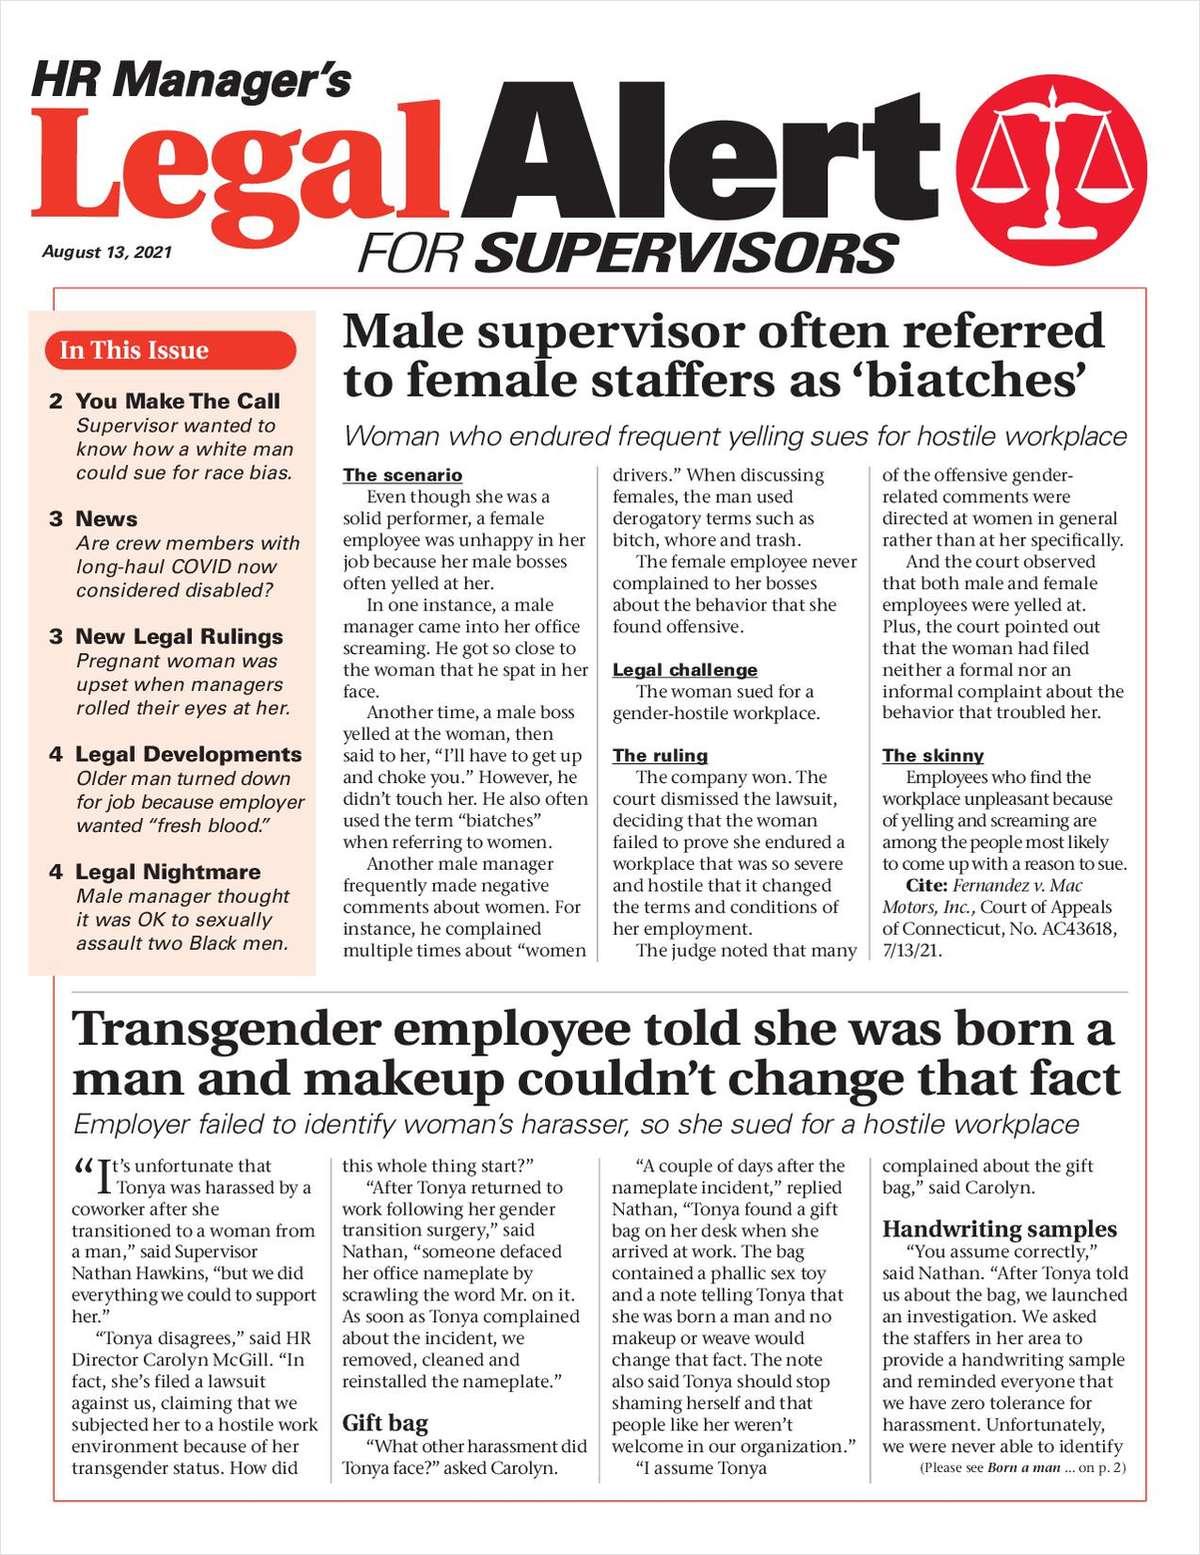 HR Manager's Legal Alert for Supervisors Newsletter: August 13 Edition